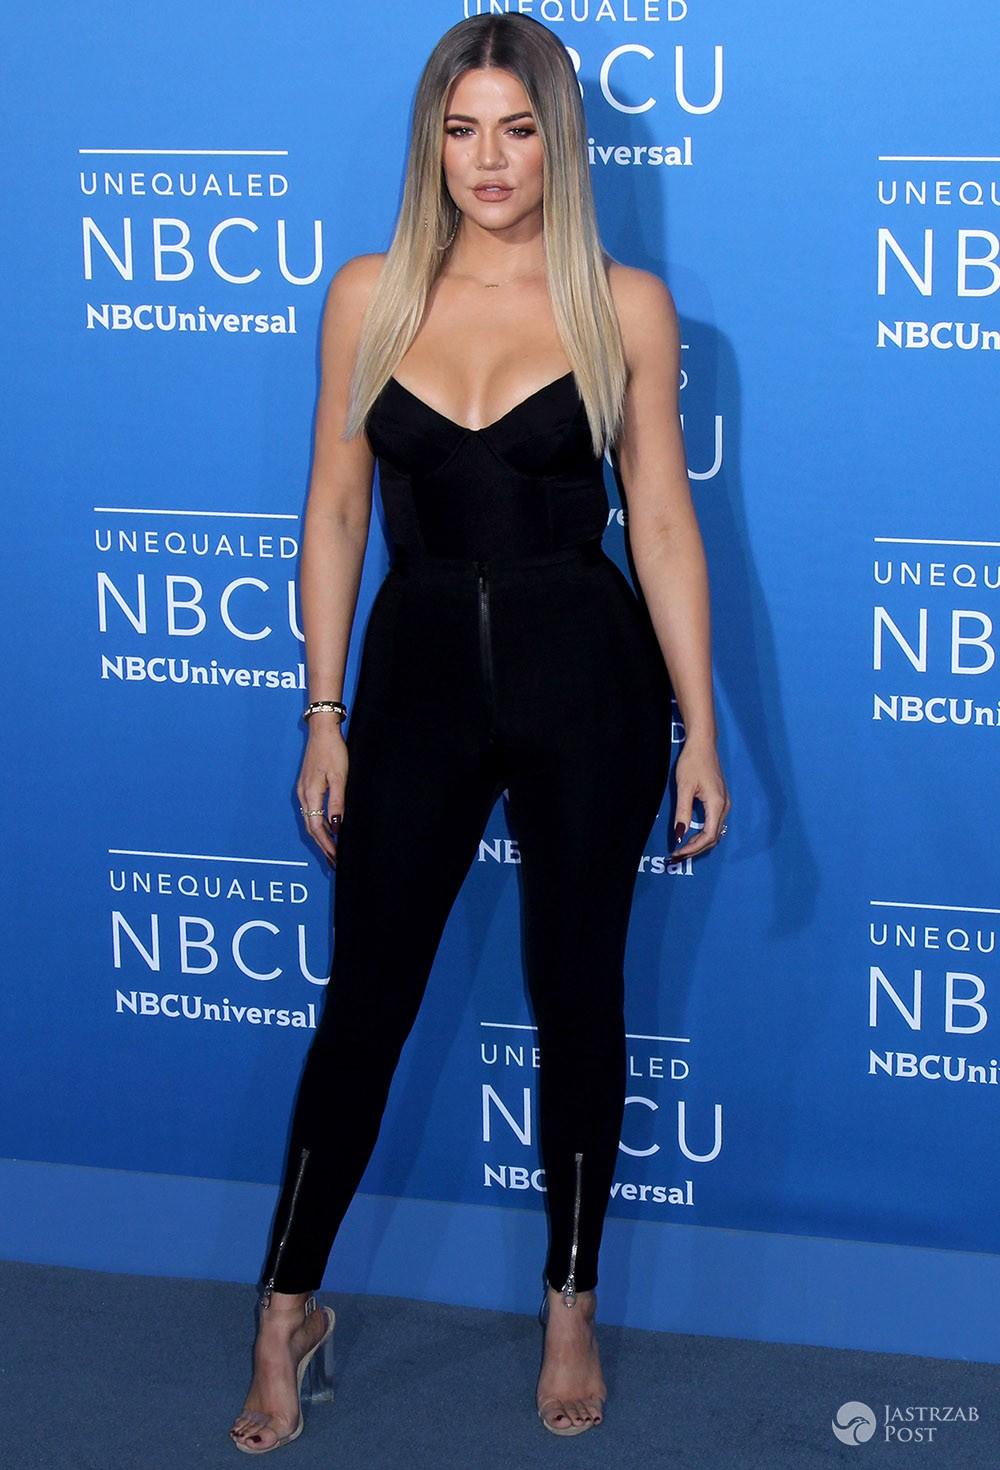 Khloe Kardashian NBCUniversal 2017 Upfront